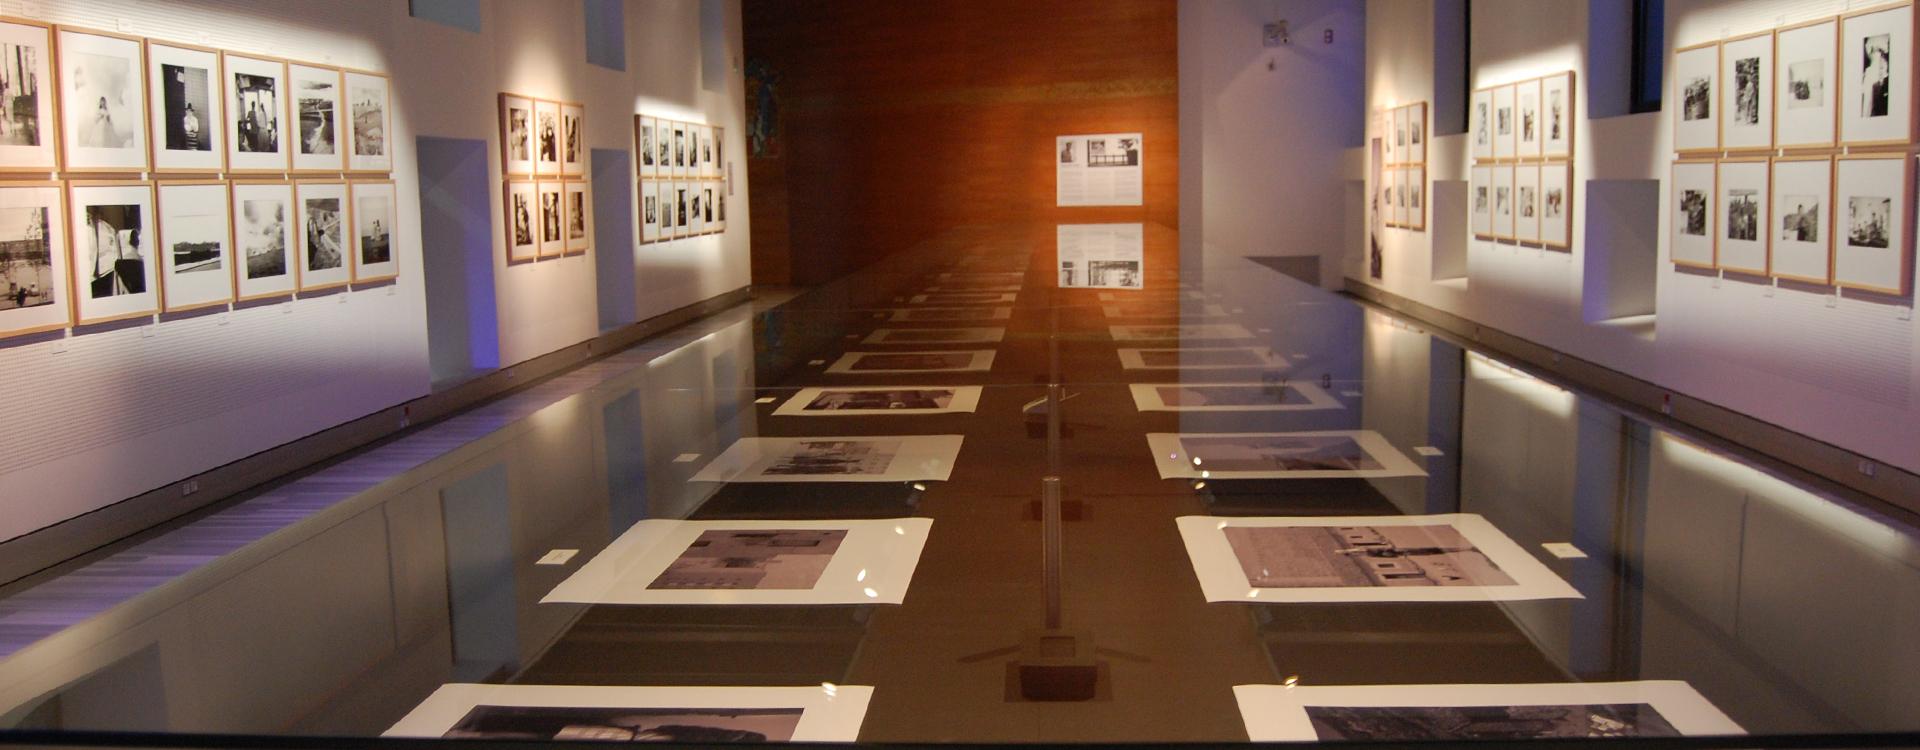 Exposició Vicente Nieto